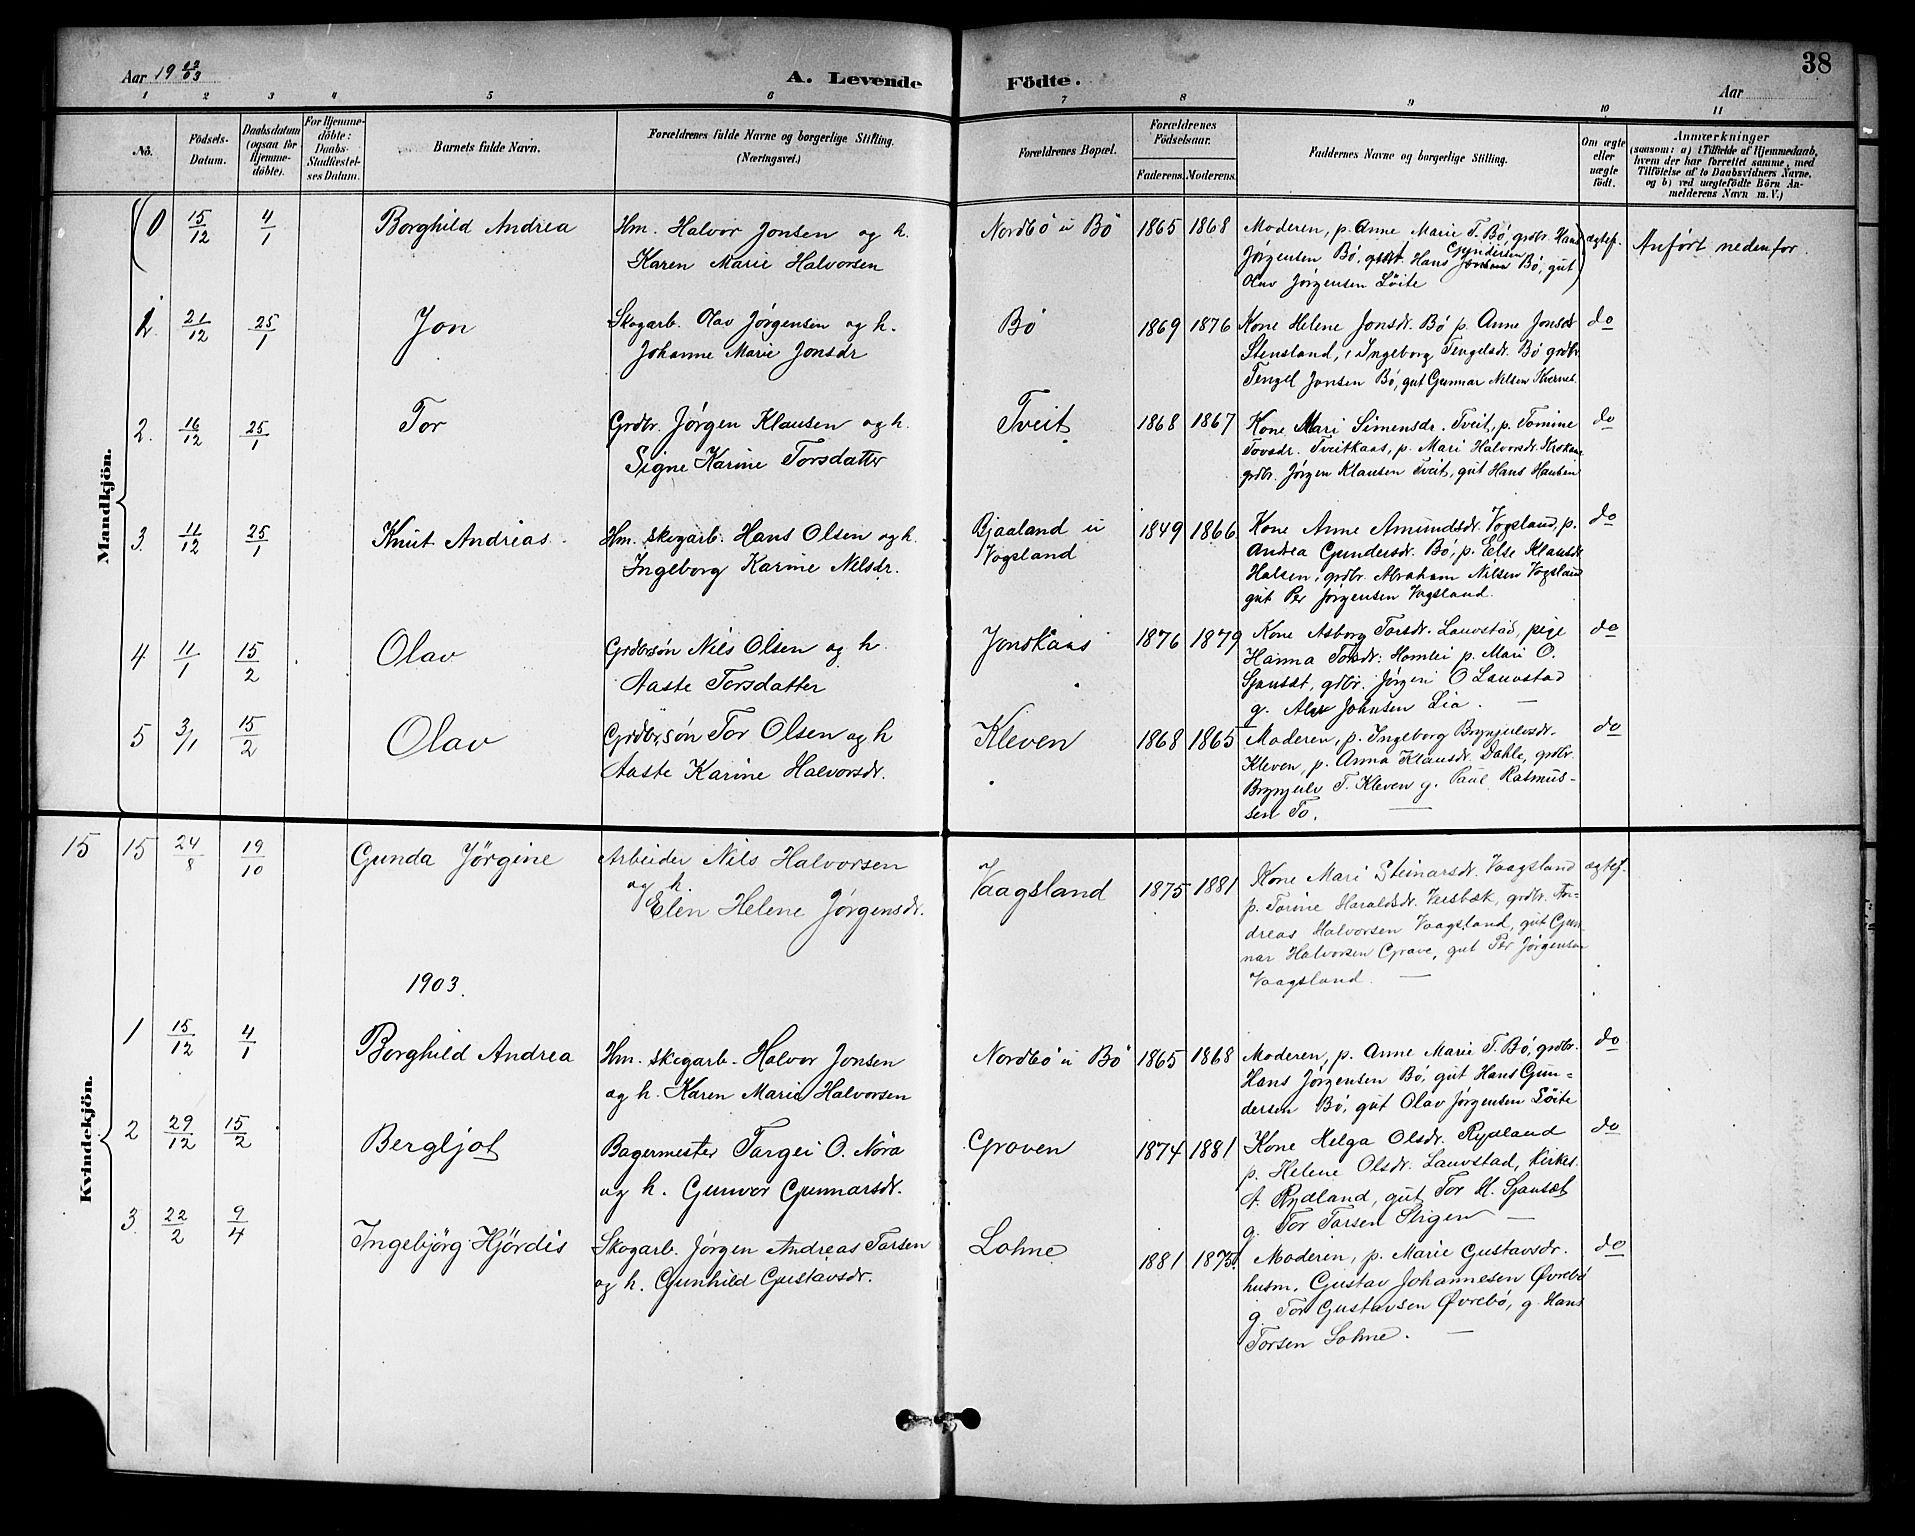 SAKO, Drangedal kirkebøker, G/Gb/L0002: Klokkerbok nr. II 2, 1895-1918, s. 38